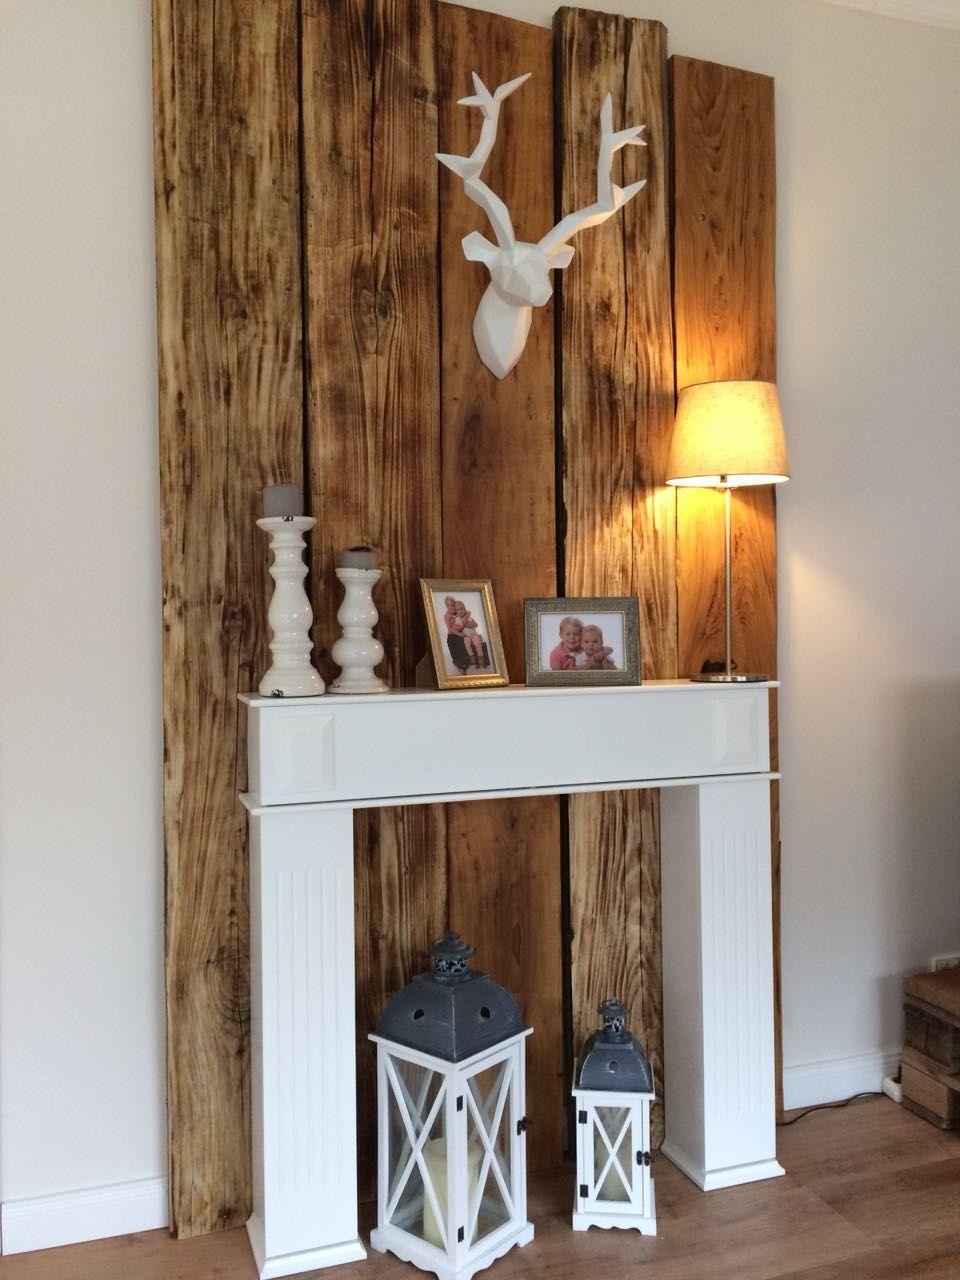 Holzwand im Wohnzimmer  Holzwand wohnzimmer, Holzwand, Holz